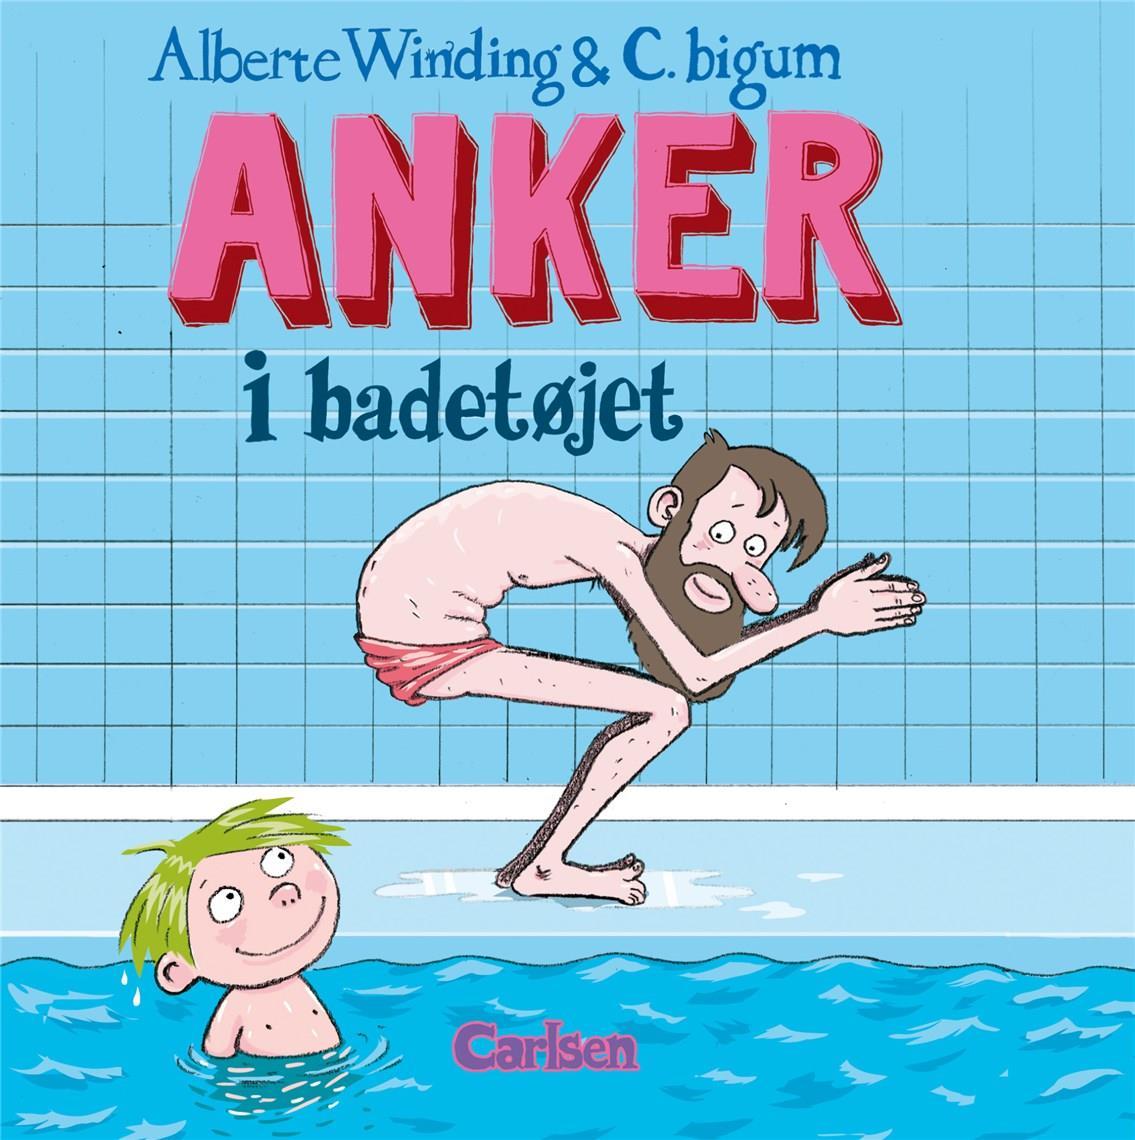 Anker: Anker (6) - Anker i badetøjet - Alberte Winding - Bøger - CARLSEN - 9788711984024 - August 11, 2020